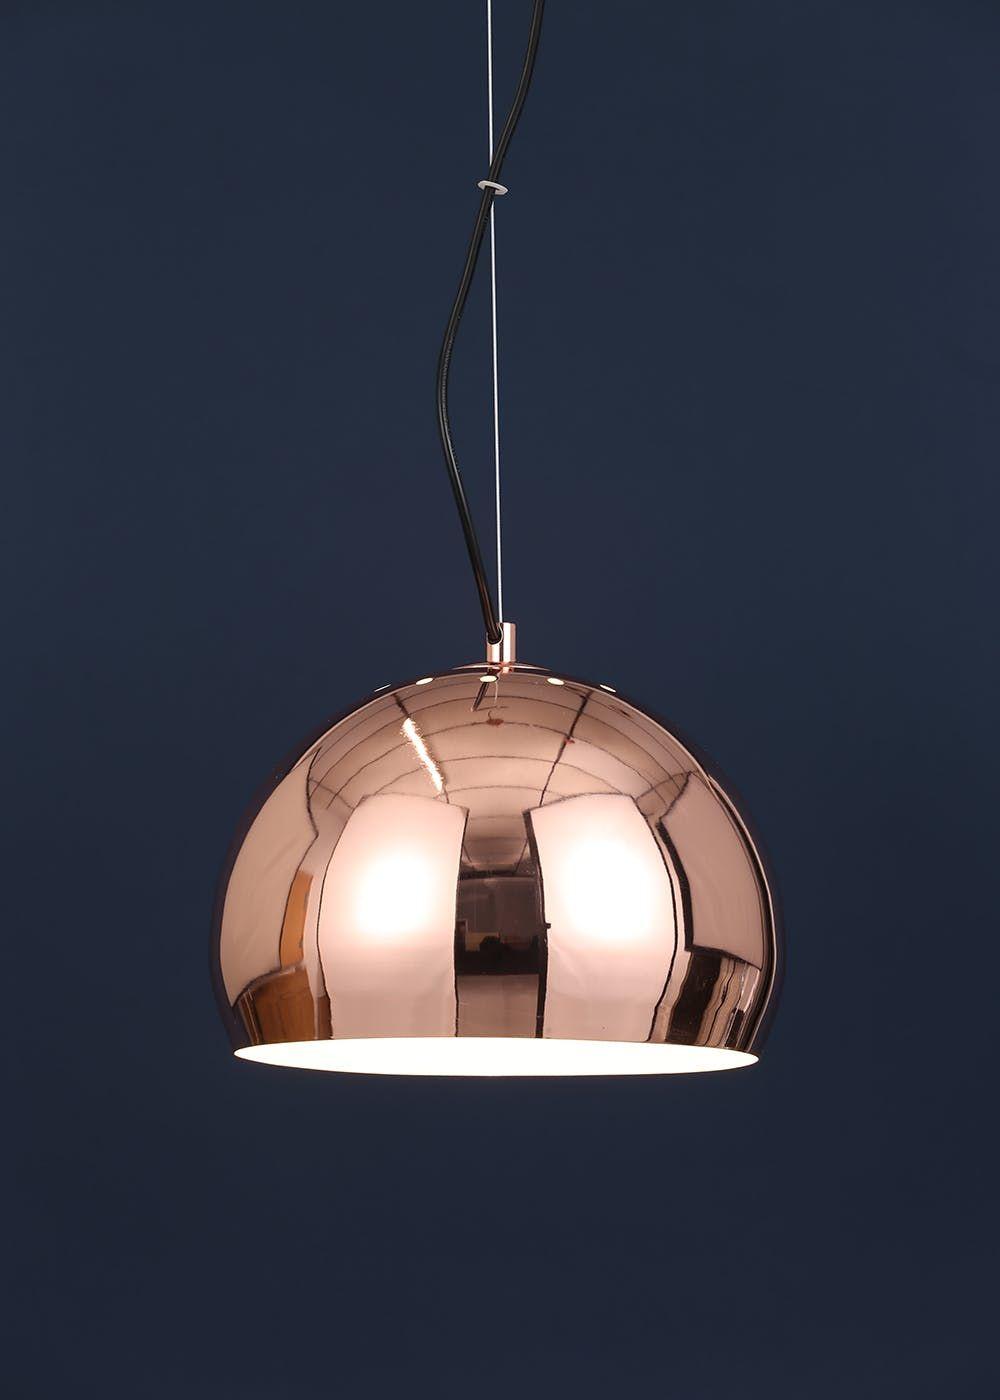 Luna Copper Ball Pendant Light H130cm 120cm X W42cm Copper